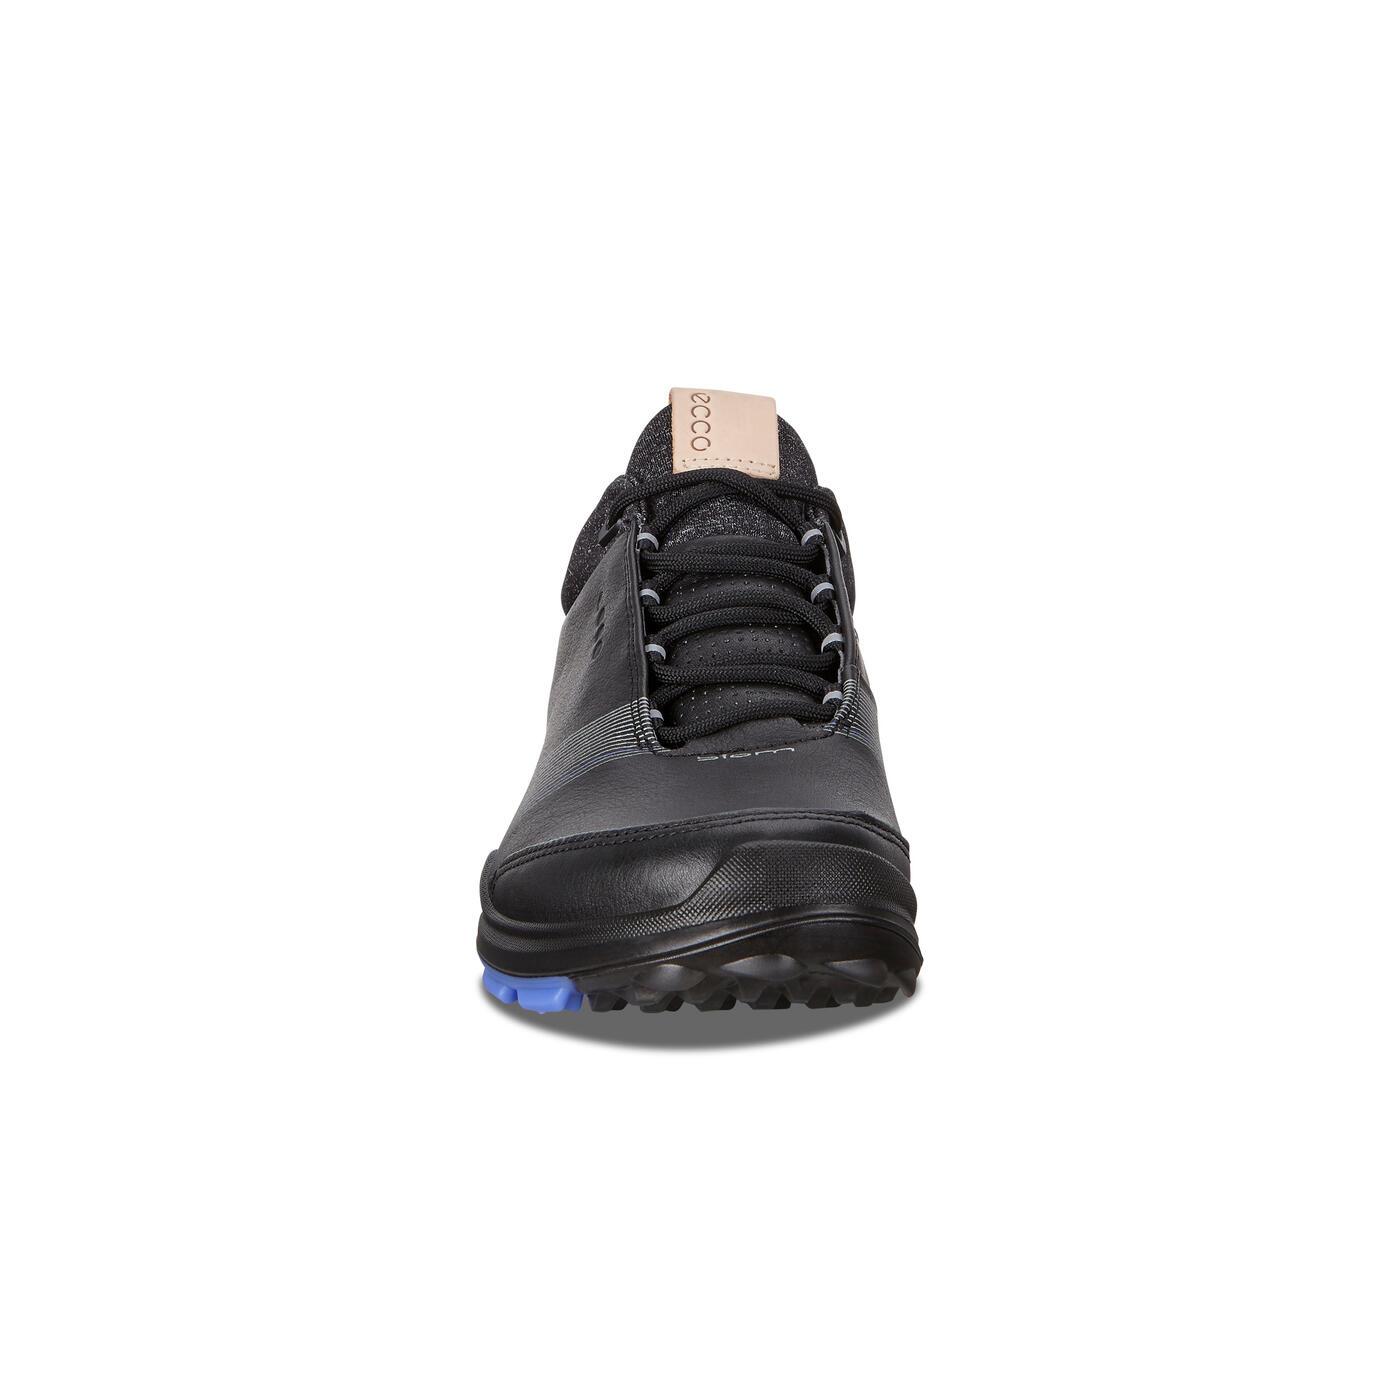 ECCO Women's Golf Biom Hybrid 3 Shoes